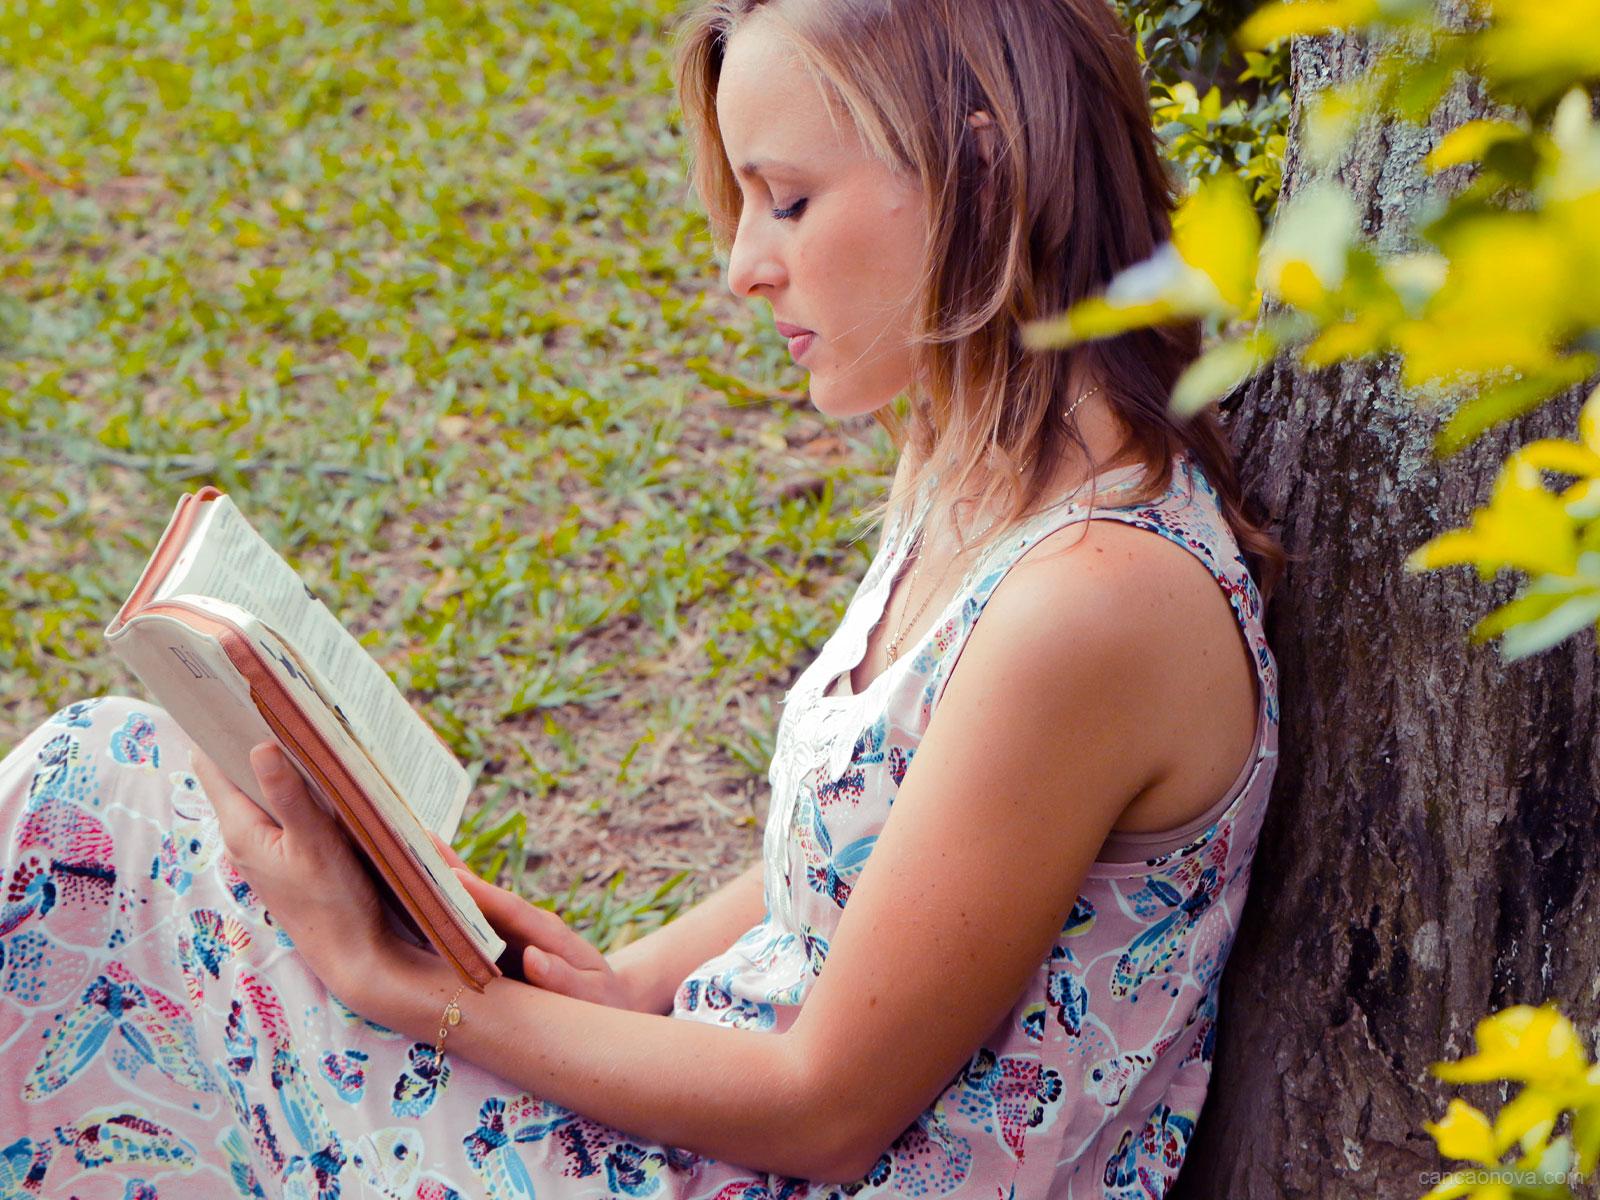 Ler-a-Bíblia-entendendo-que-tudo-converge-para-Jesus